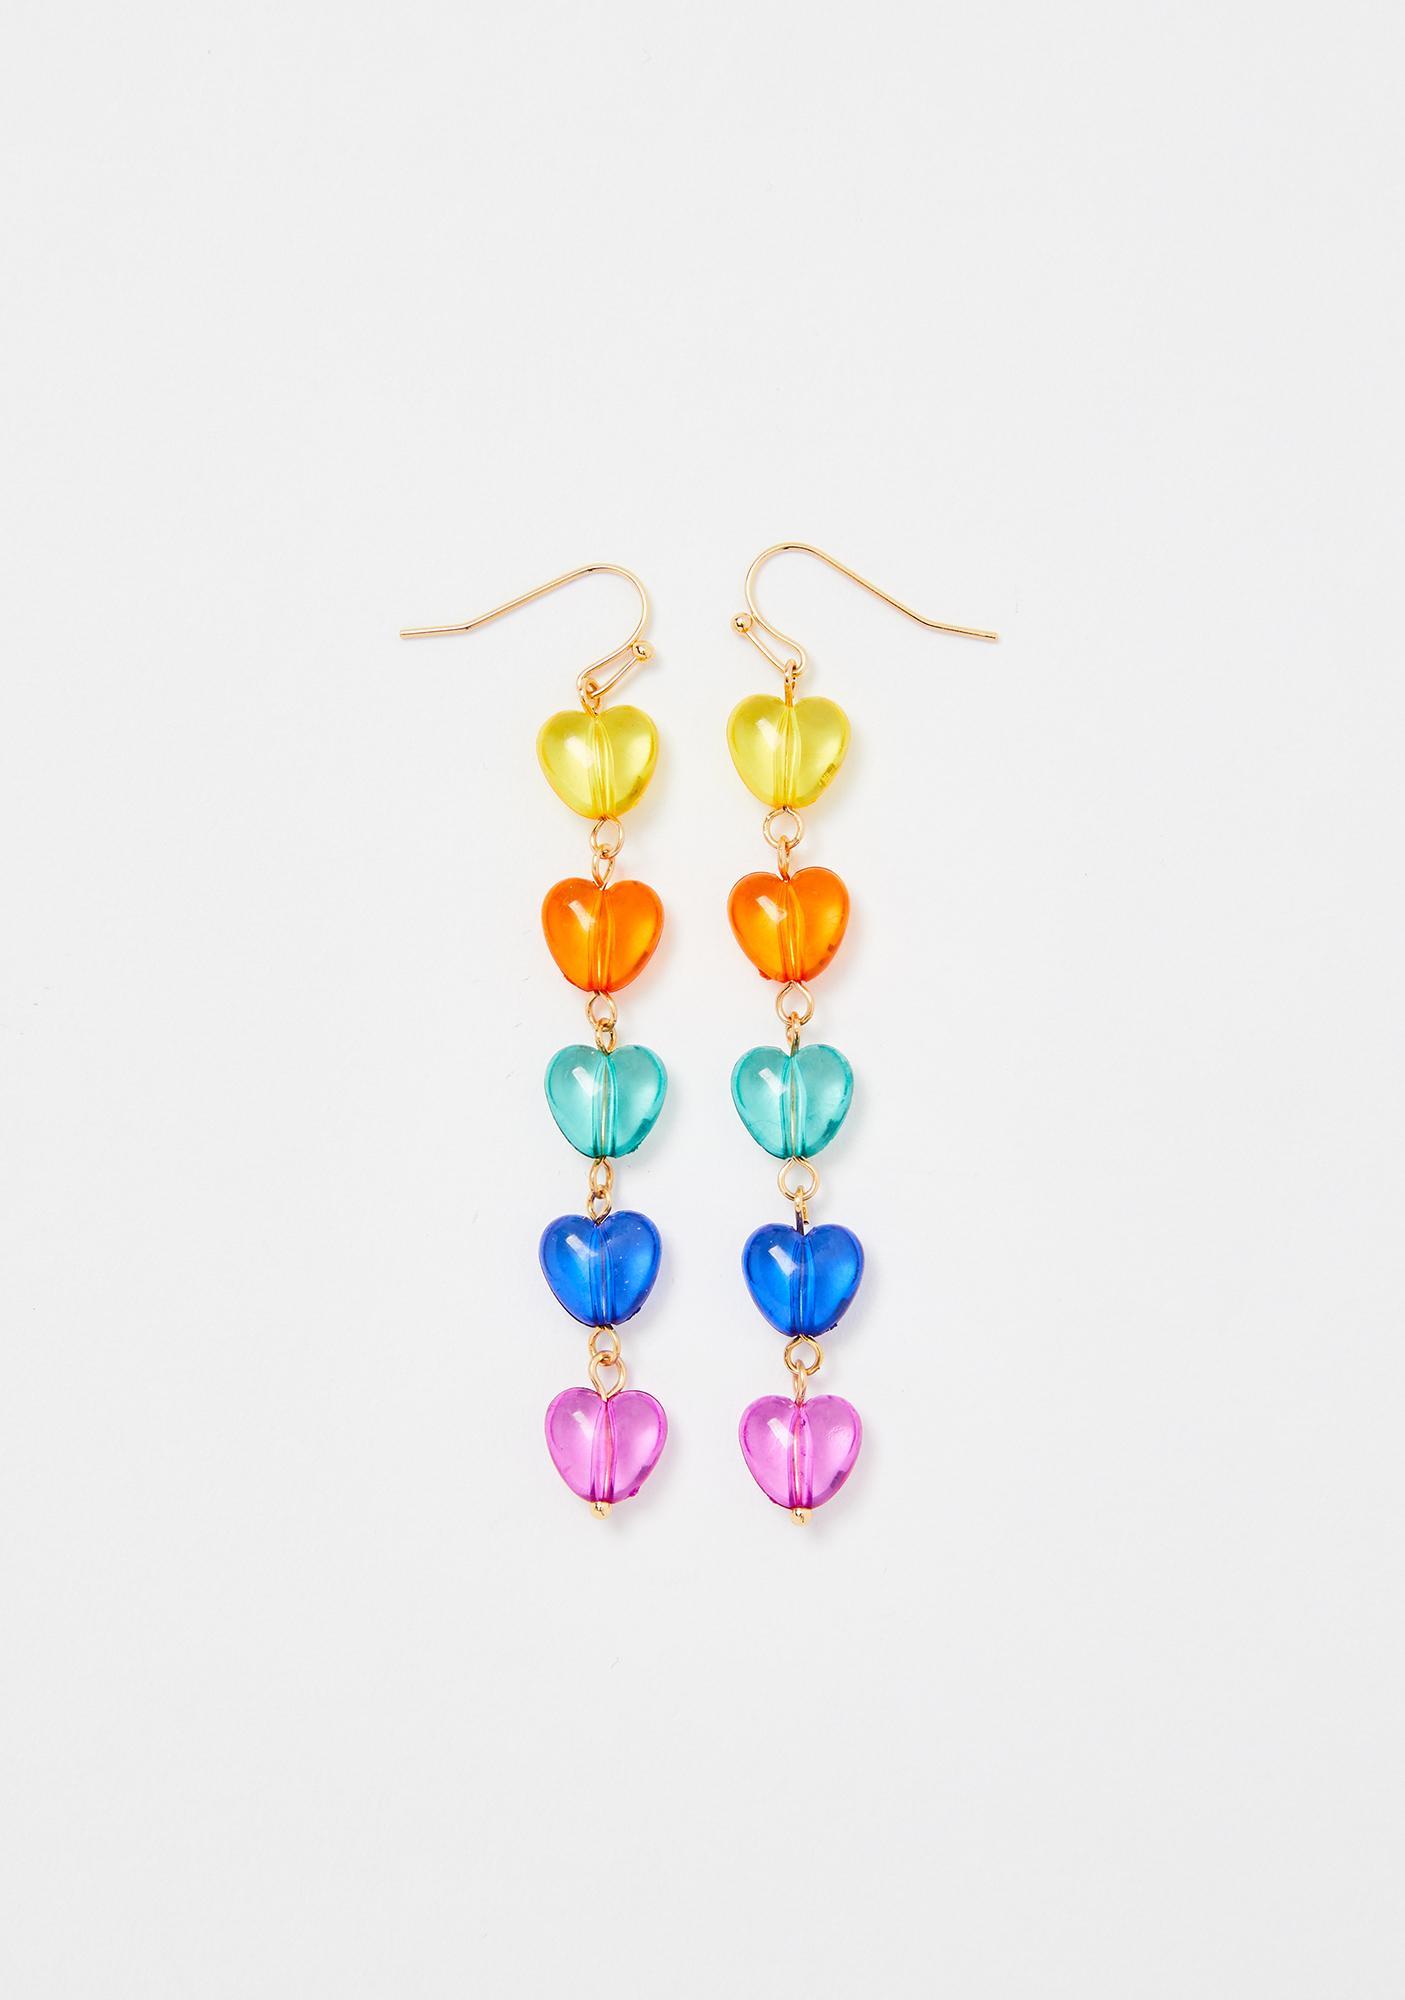 Easy To Love Dangle Earrings